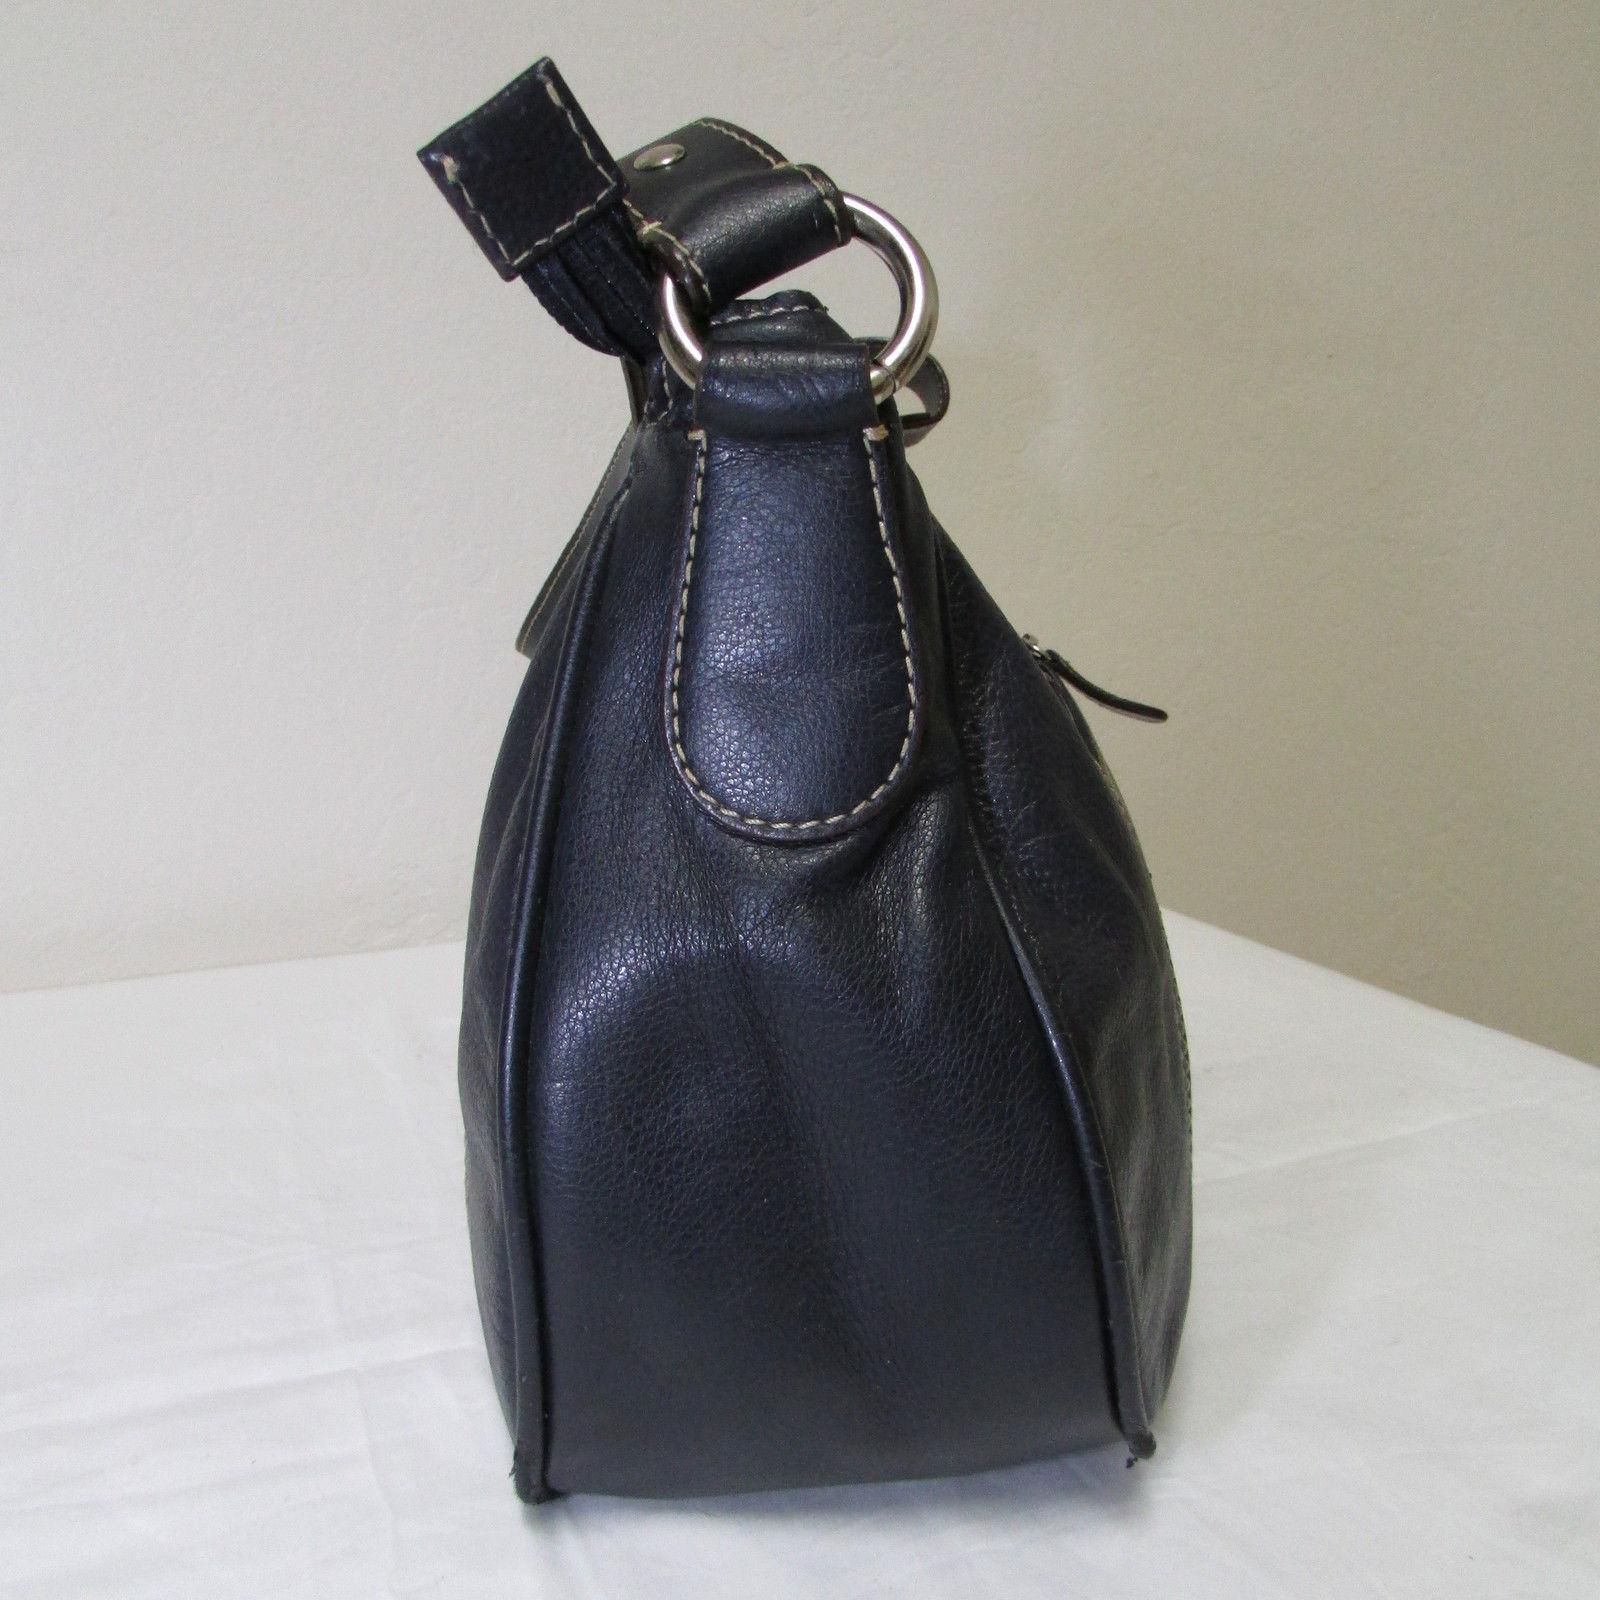 Wilsons Navy Blue Baguette With Silver Slide Lock